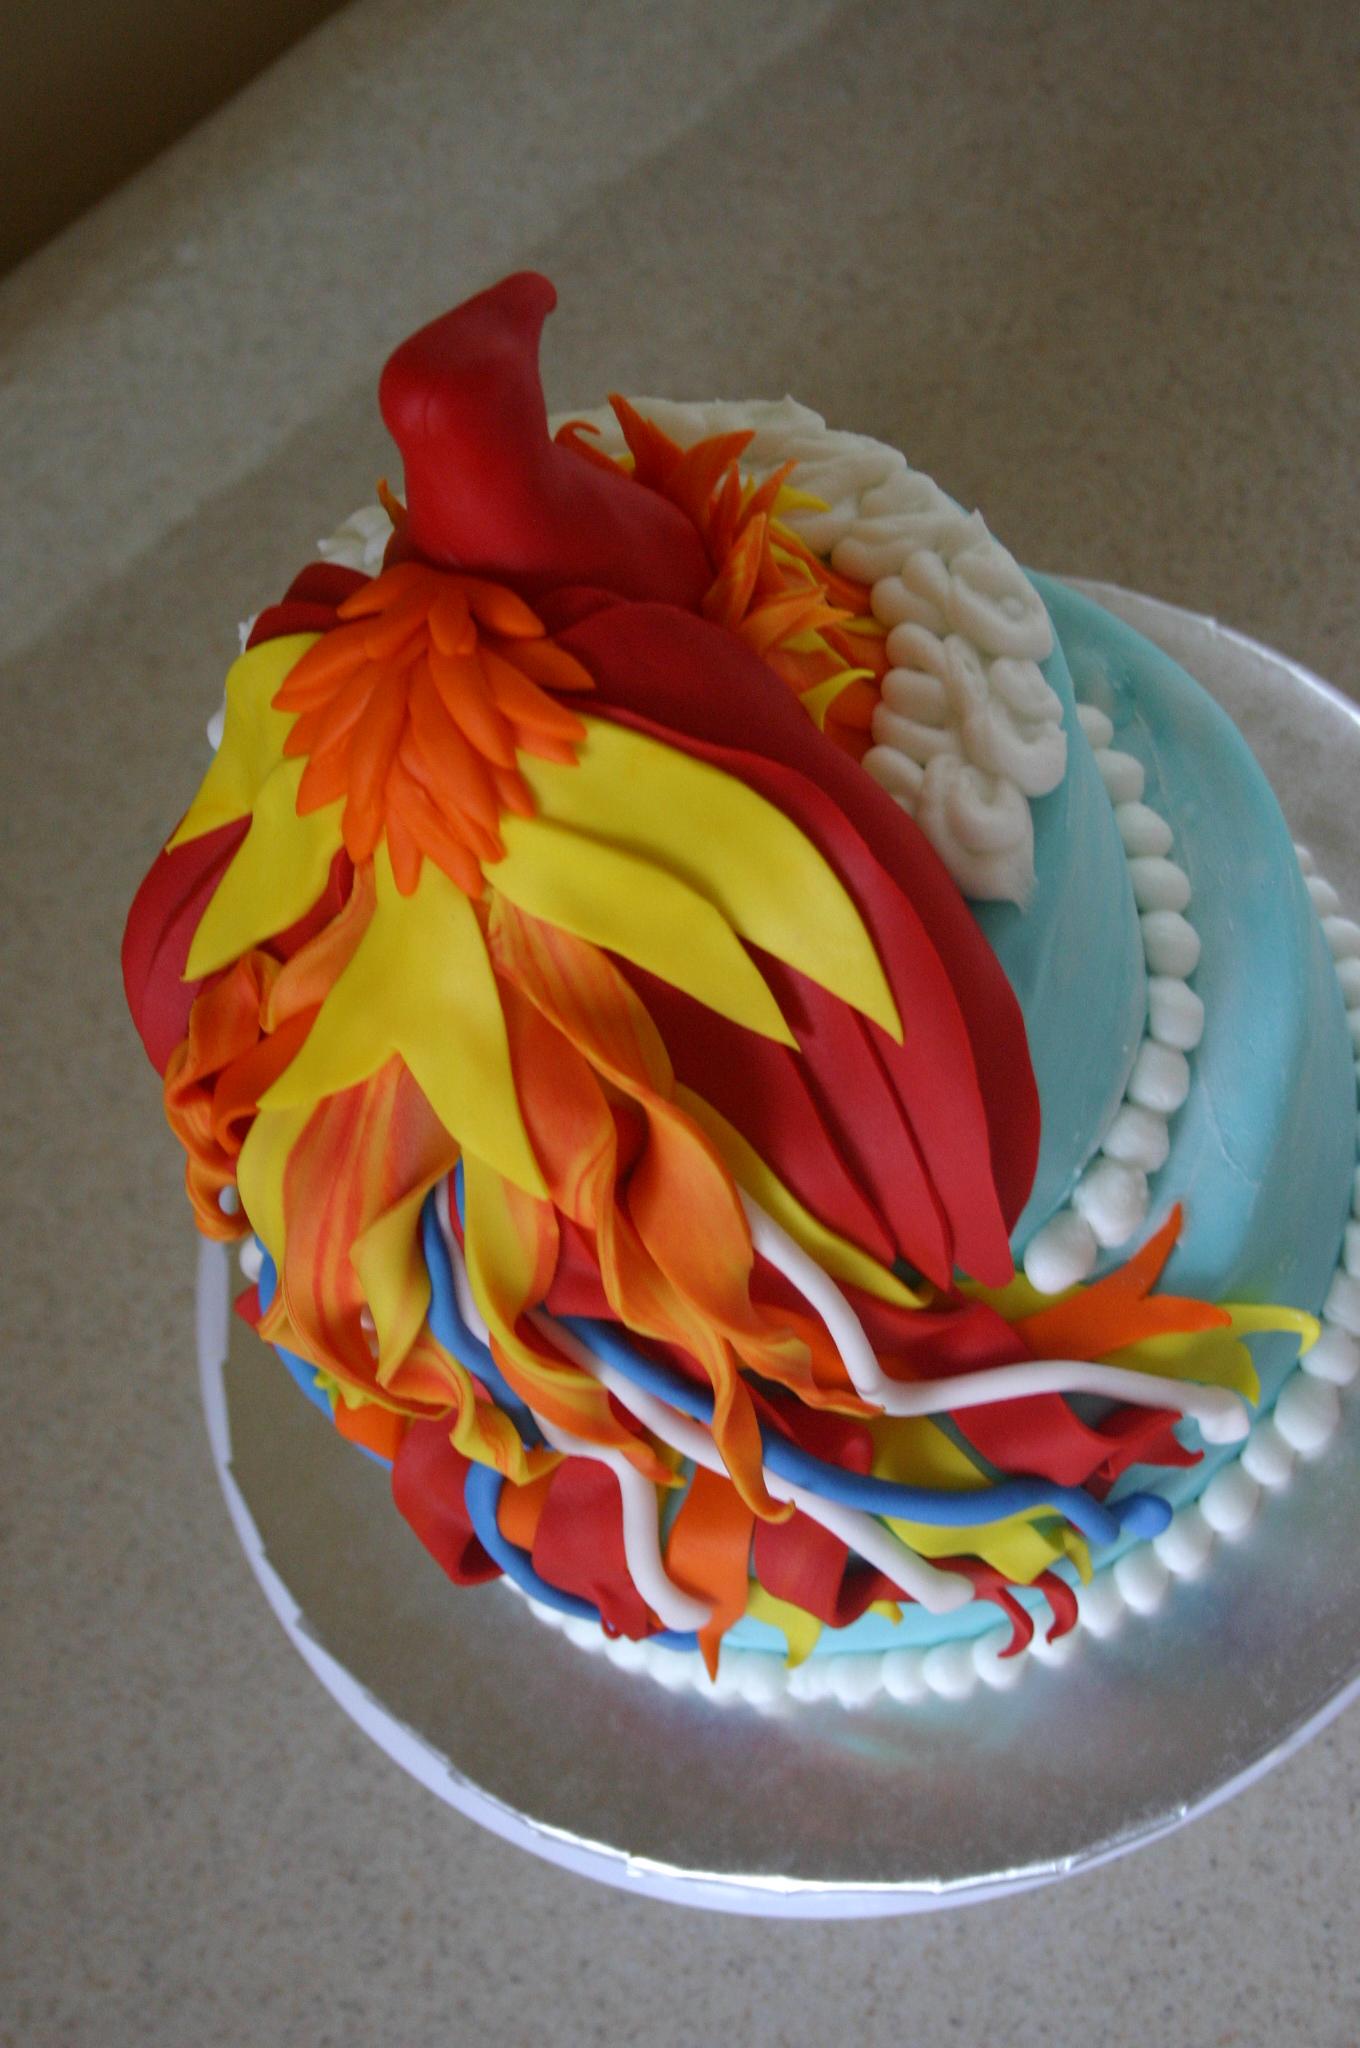 Cake Bakeries In Phoenix Kinds Of Cakes Onteevo